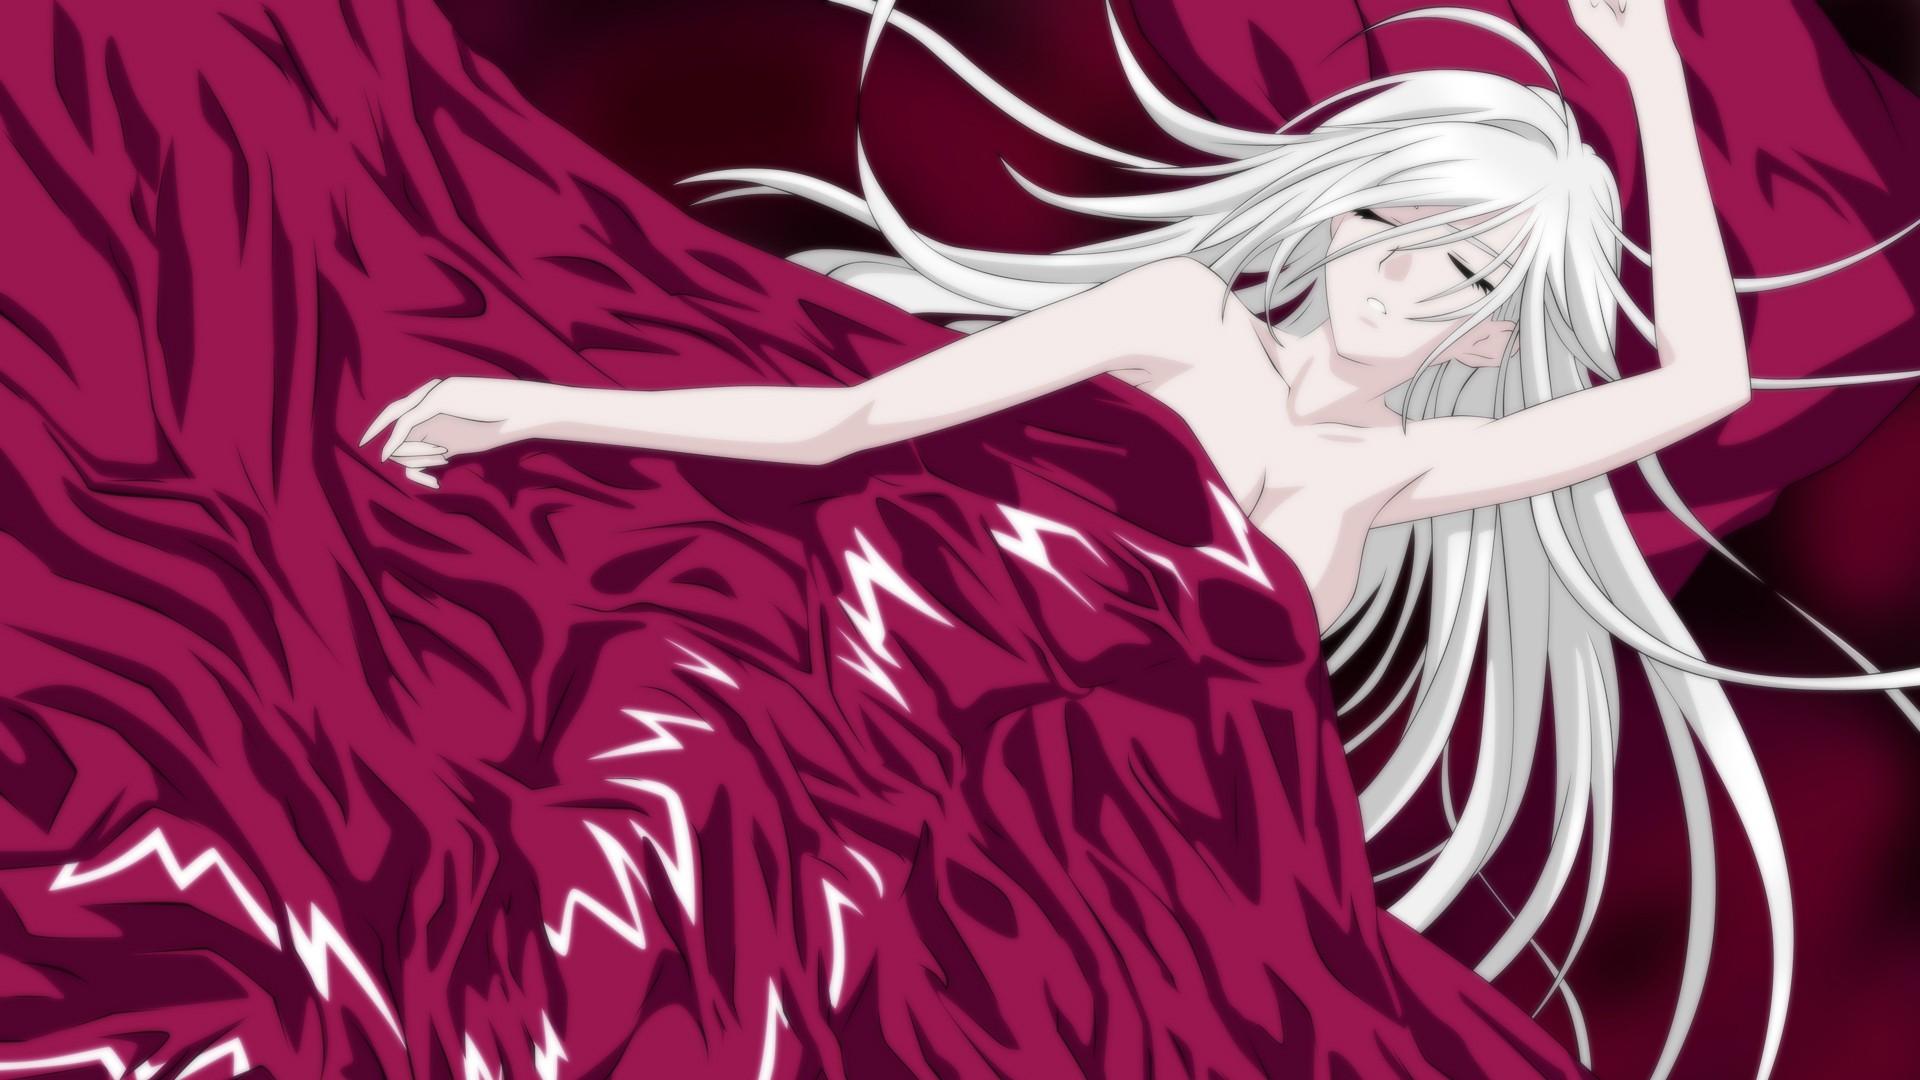 Wallpaper Illustration Closed Eyes Anime Girls Rosario